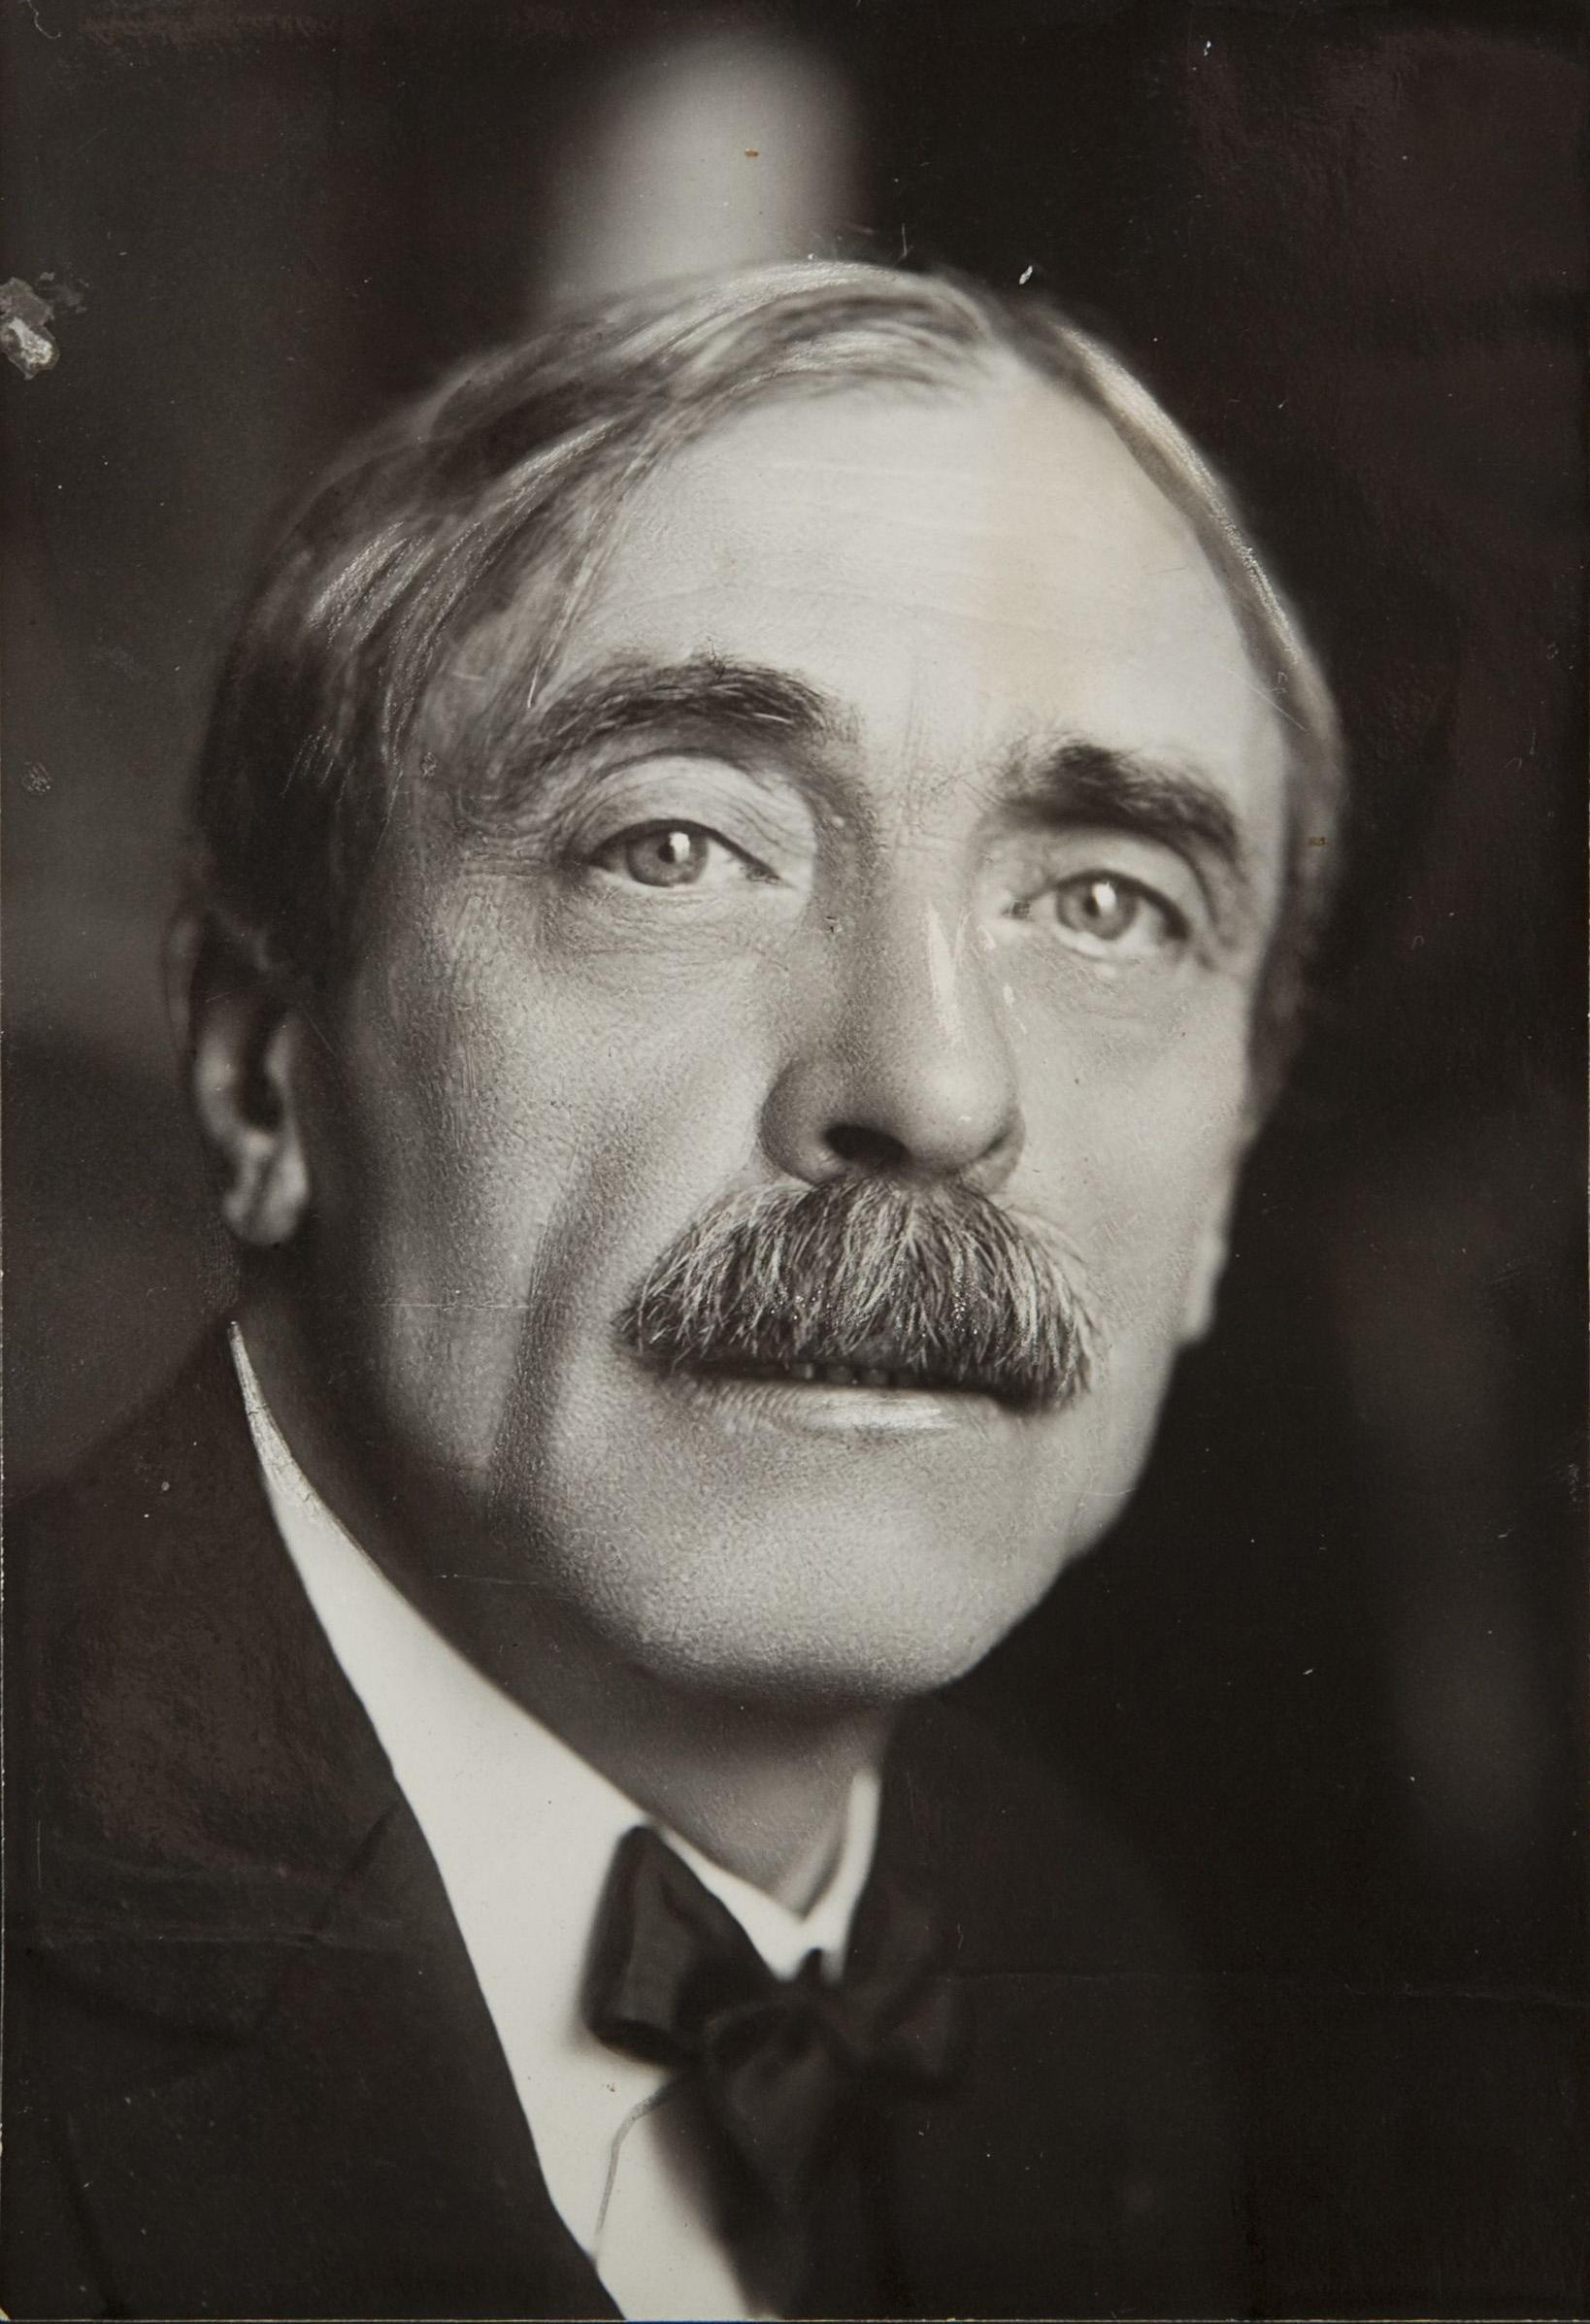 Paul Valéry photographed by [[Henri Manuel]], 1920s.